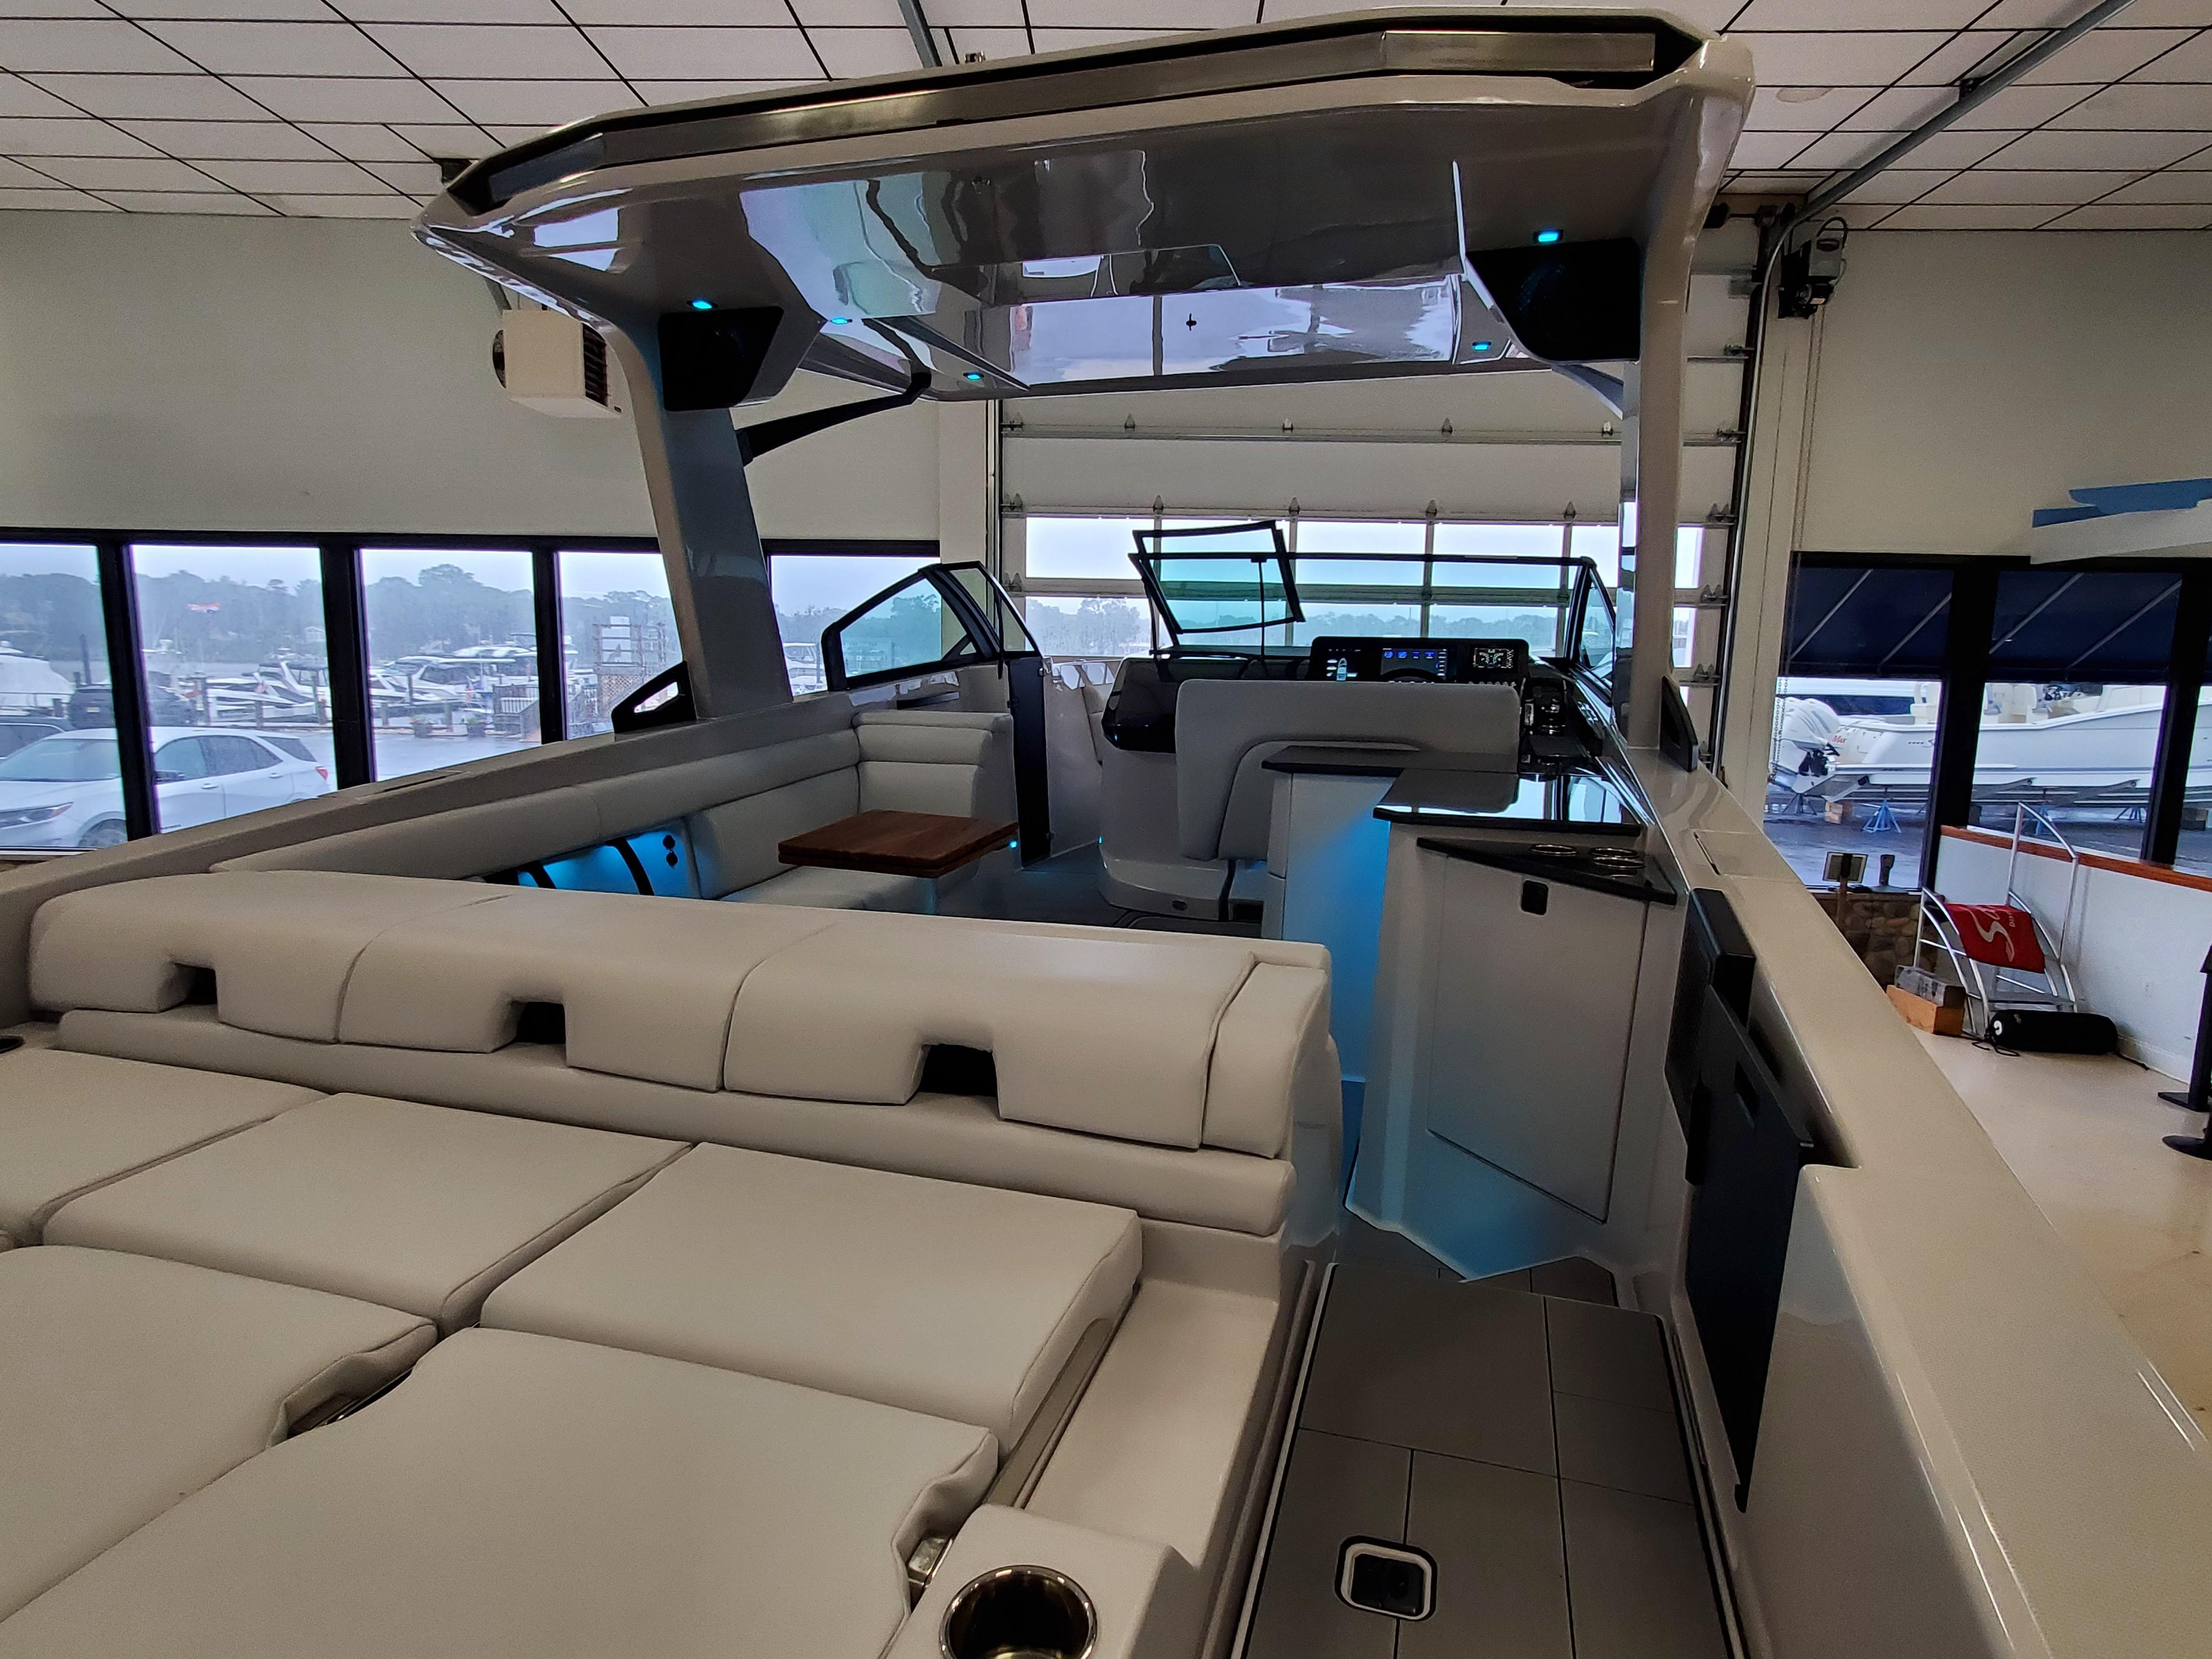 2021 Aviara                                                              AV32 Outboard Image Thumbnail #8